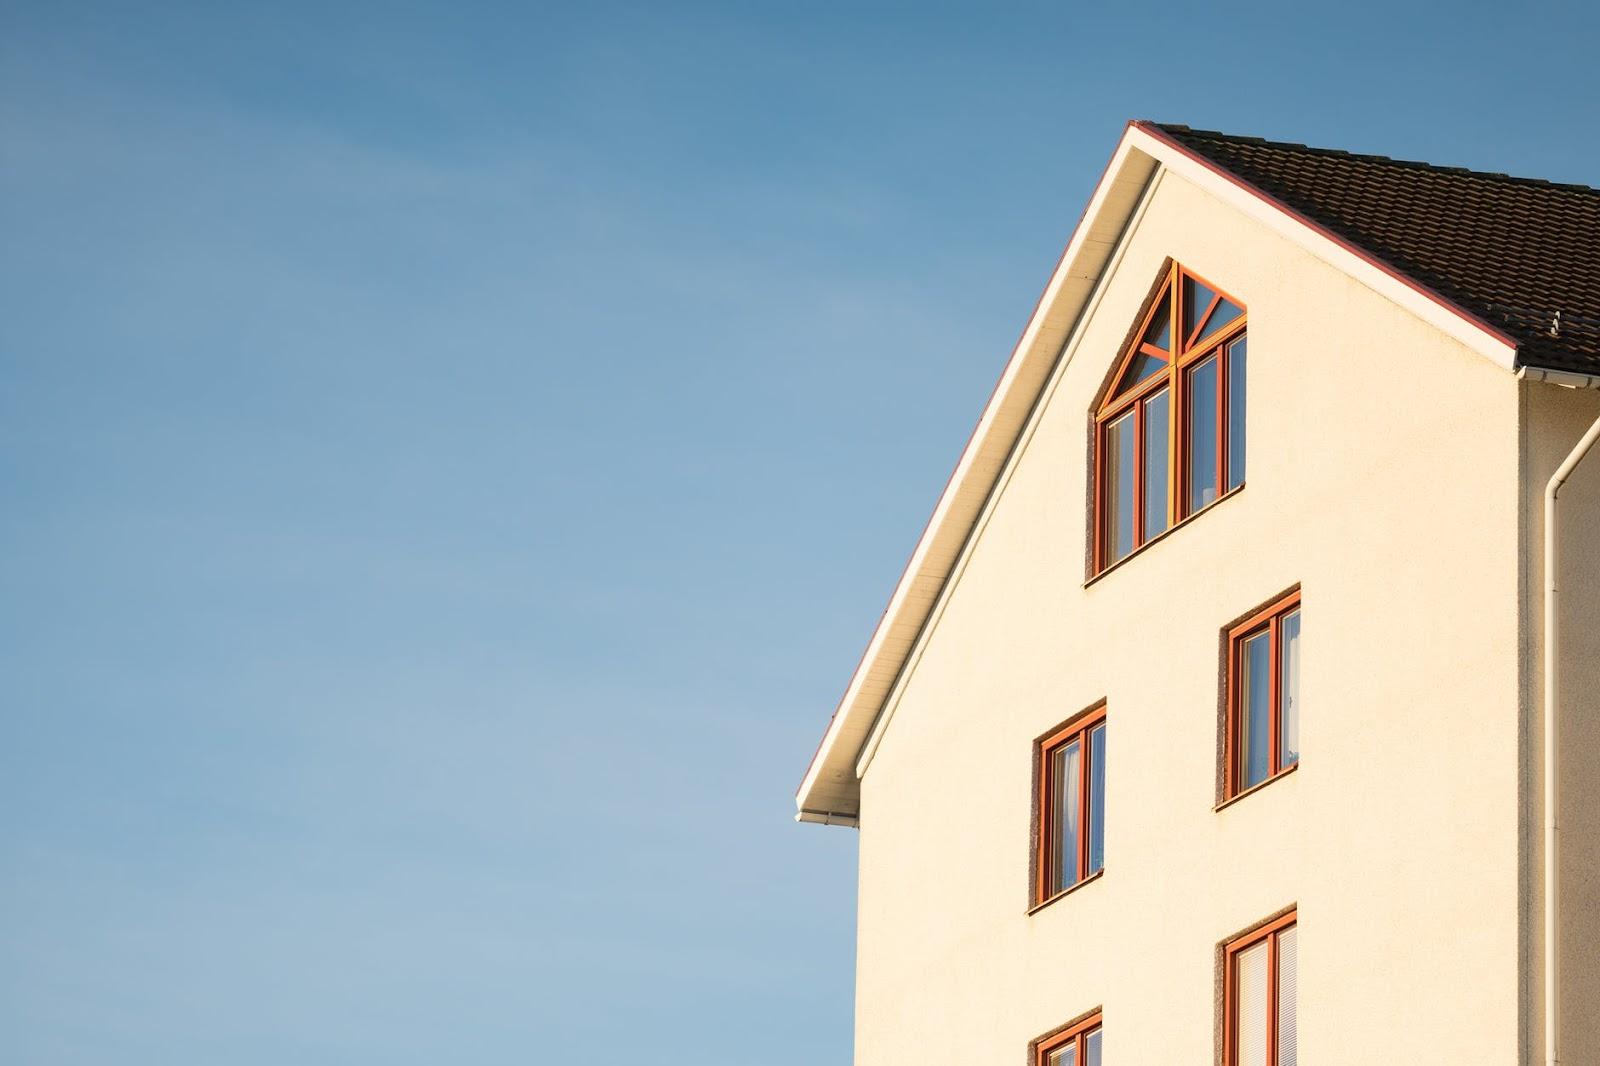 perform roof repairs thoroughly